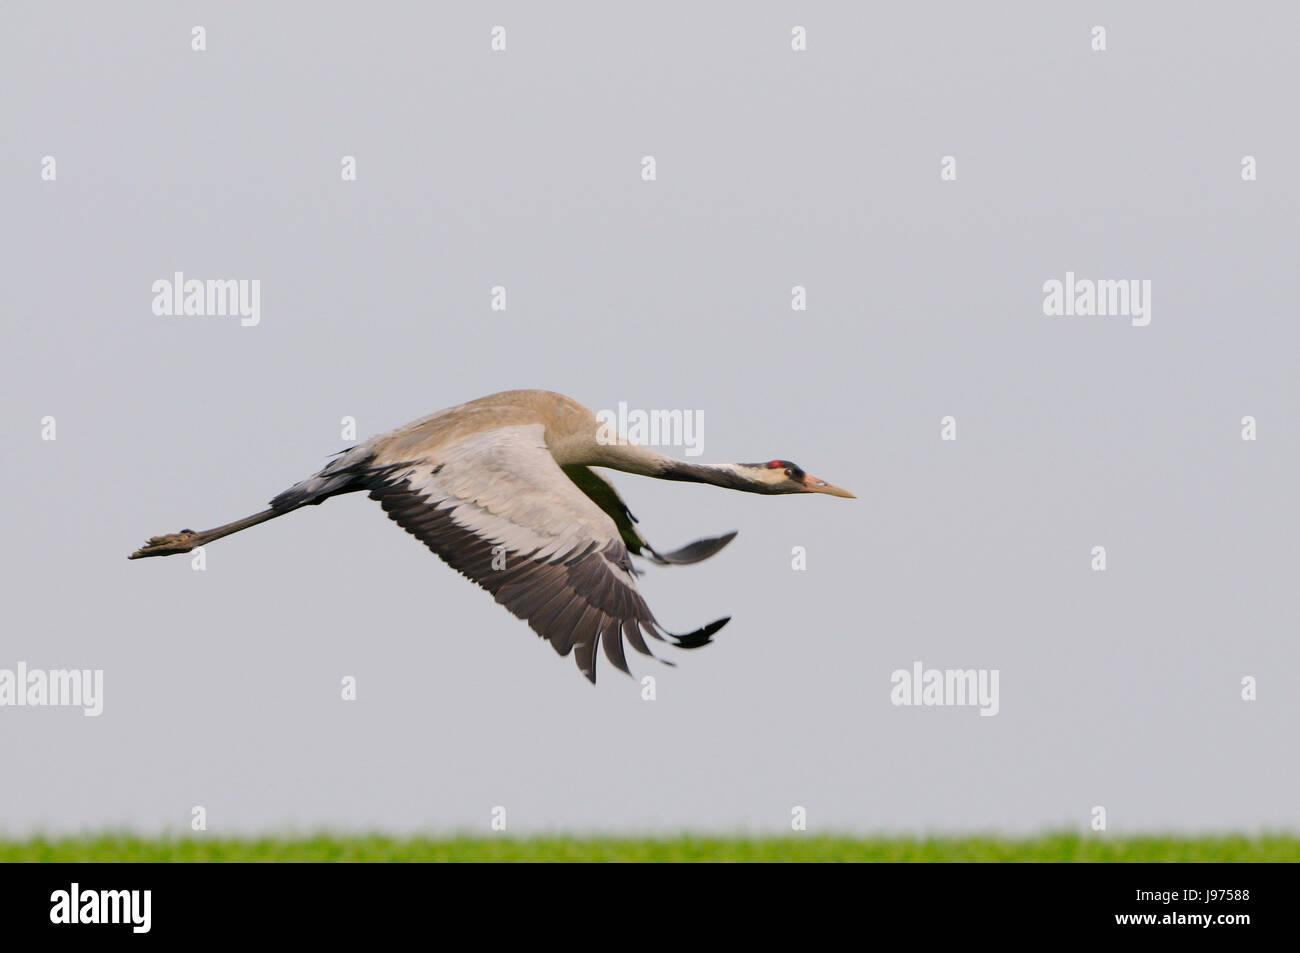 animal, bird, asia, animals, birds, blank, european, caucasian, europe, spring, Stock Photo